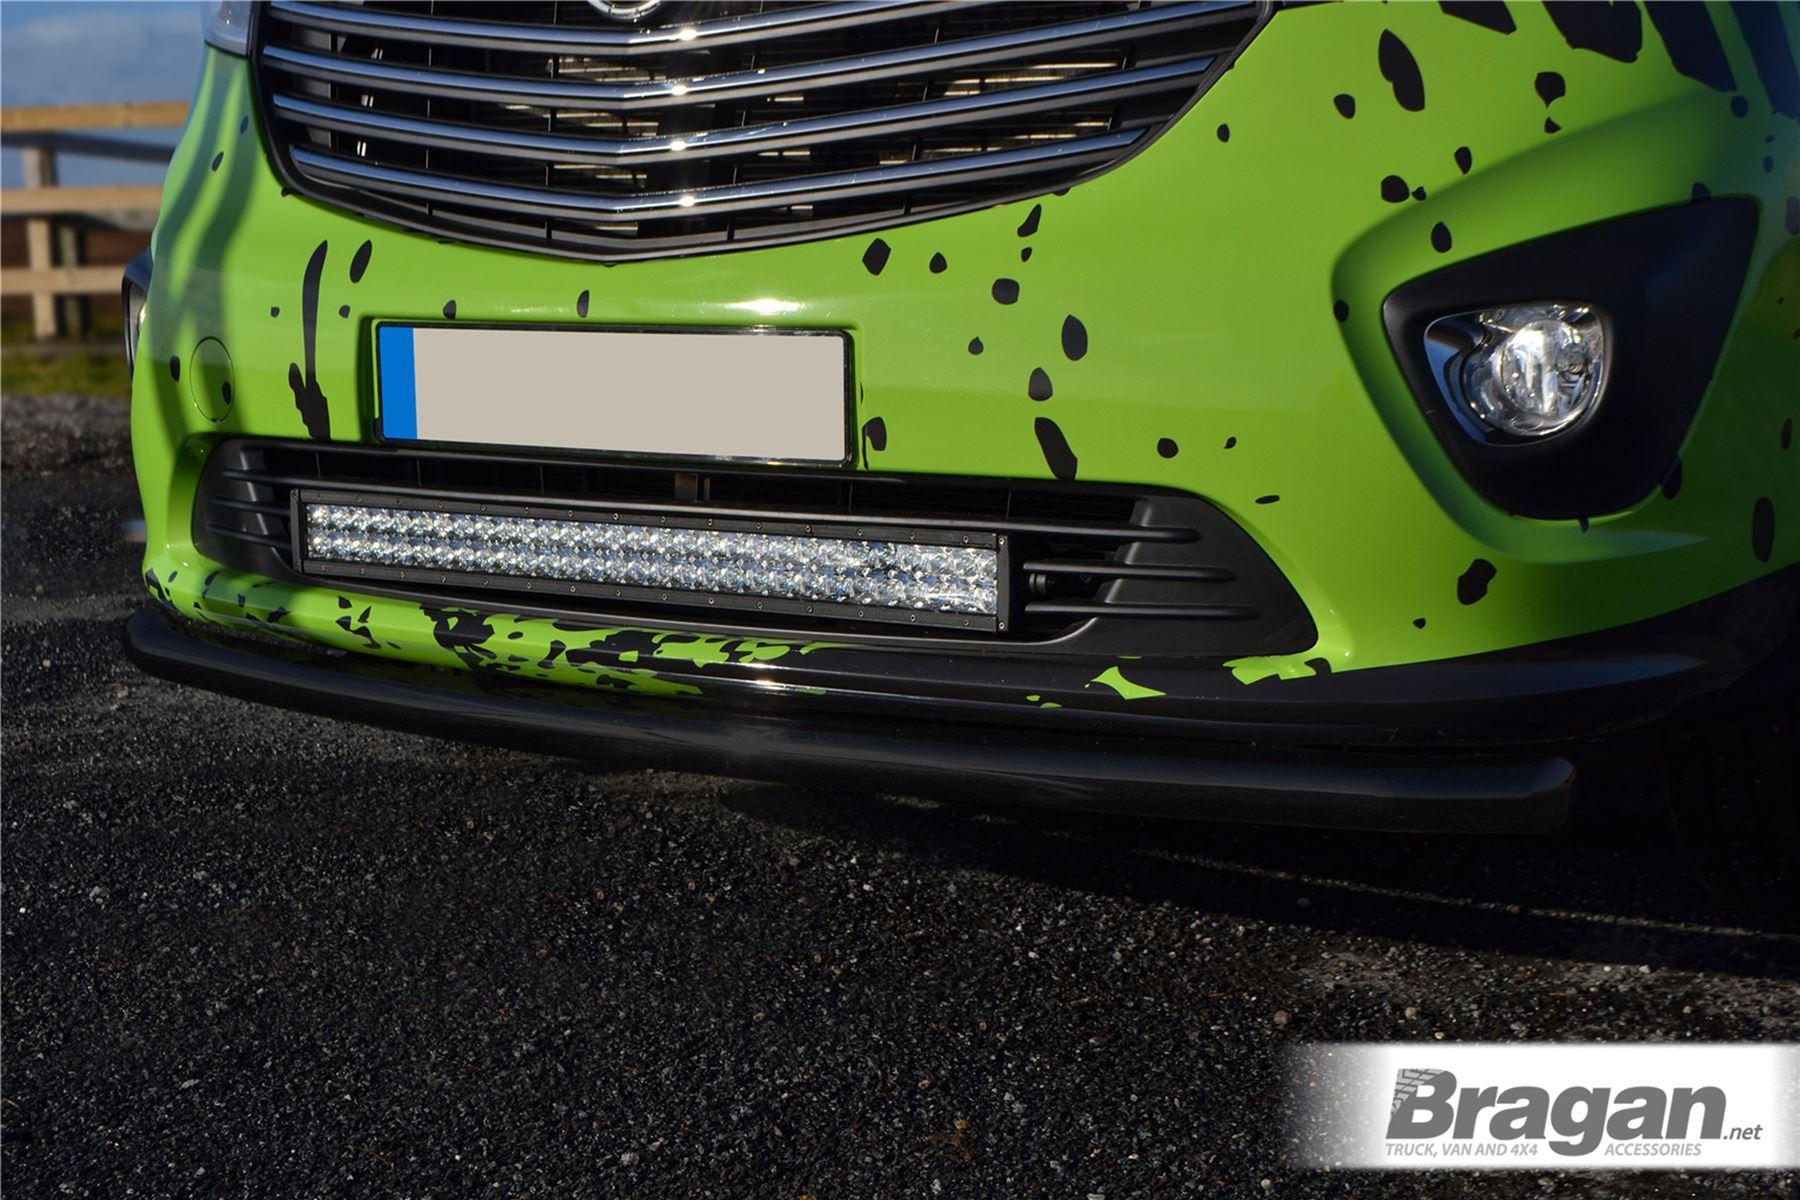 Fitting Kit Bragan BRA34512-BLACK Van SUV 4x4 Bumper Nudge Chin Front Spoiler Bar Black Stainless Steel